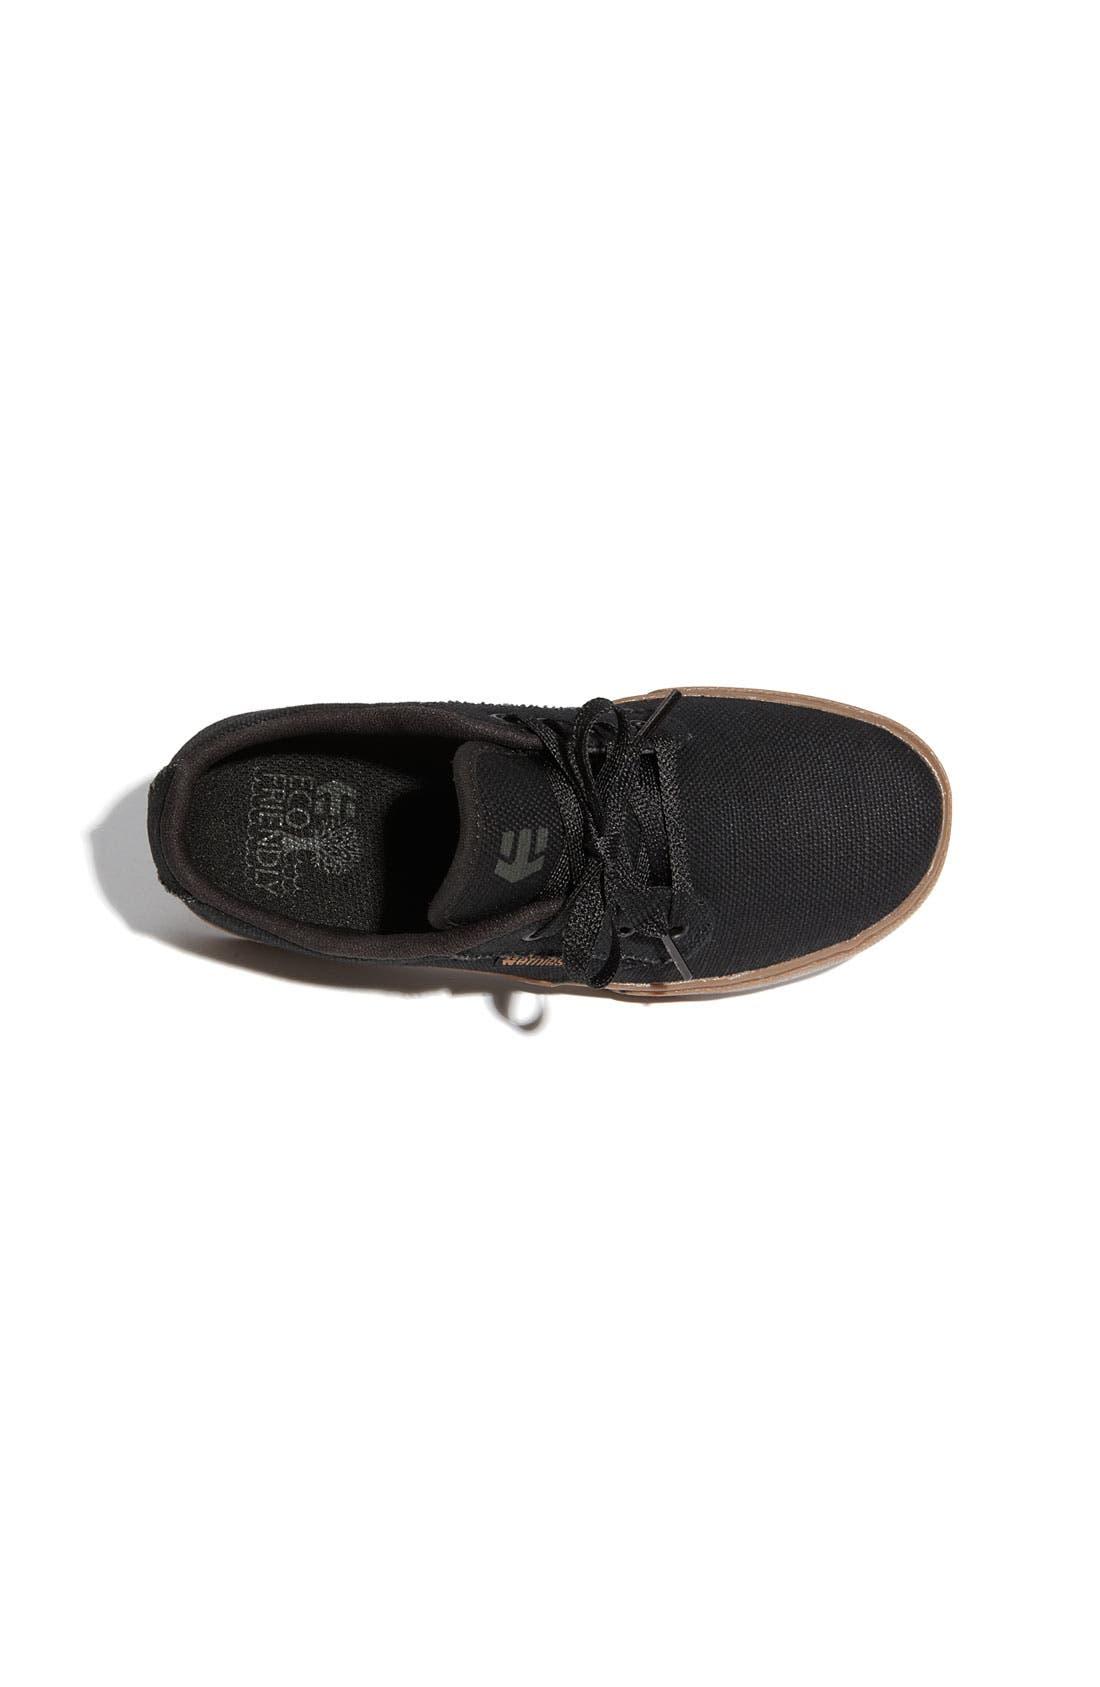 Alternate Image 3  - Etnies 'Jameson 2' Skate Shoe (Toddler, Little Kid & Big Kid)